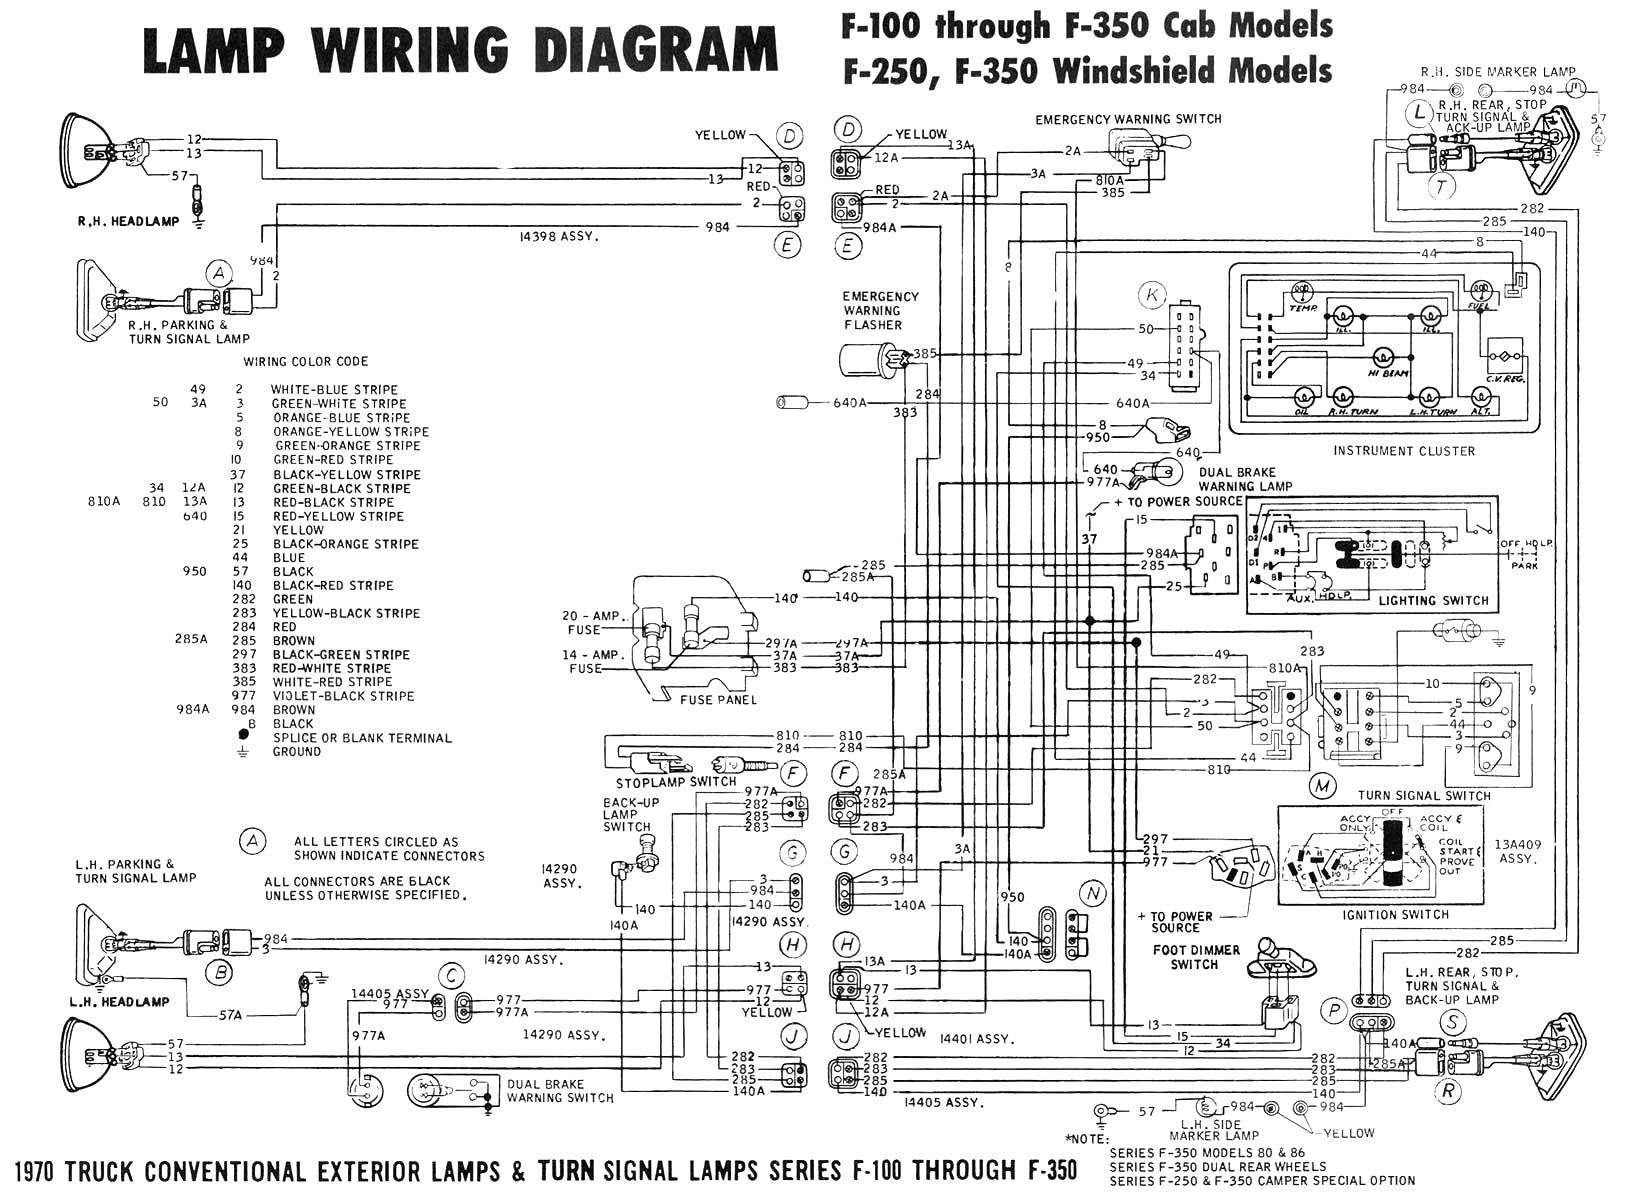 finn wiring diagrams data schematic diagram find wiring diagram 2003 cub cadet 1050 mower finn wiring diagrams